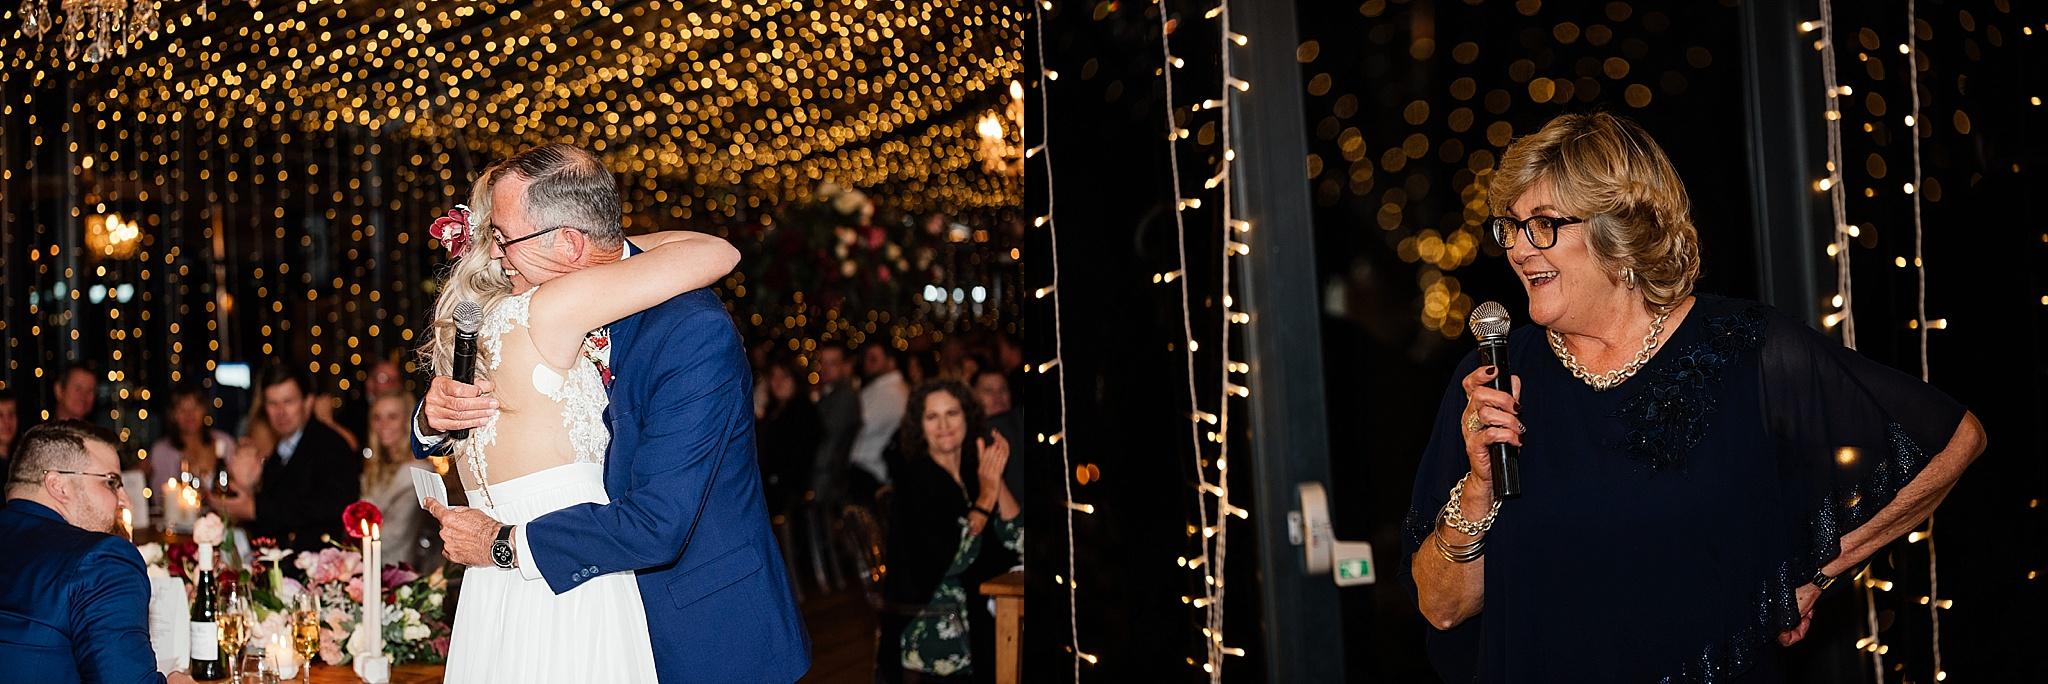 Cape Town Photographer Darren Bester - Die Woud Wedding - Gareth & Roxanne_0050.jpg